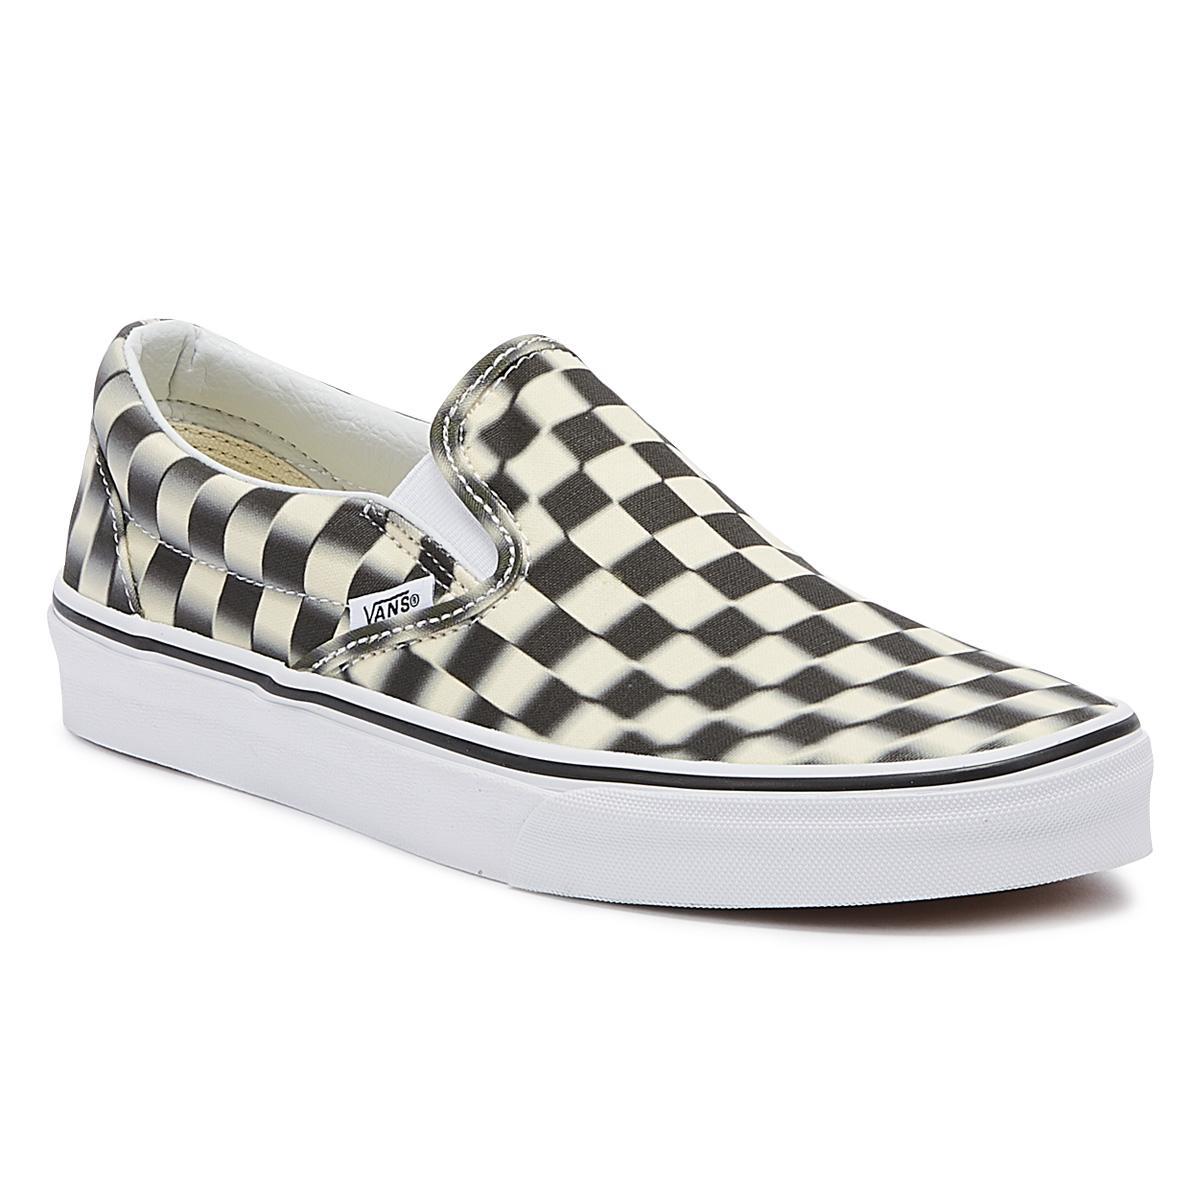 c85a7e0511 Lyst - Vans Classic Slip-on Black Blur Checkerboard Trainers in Black